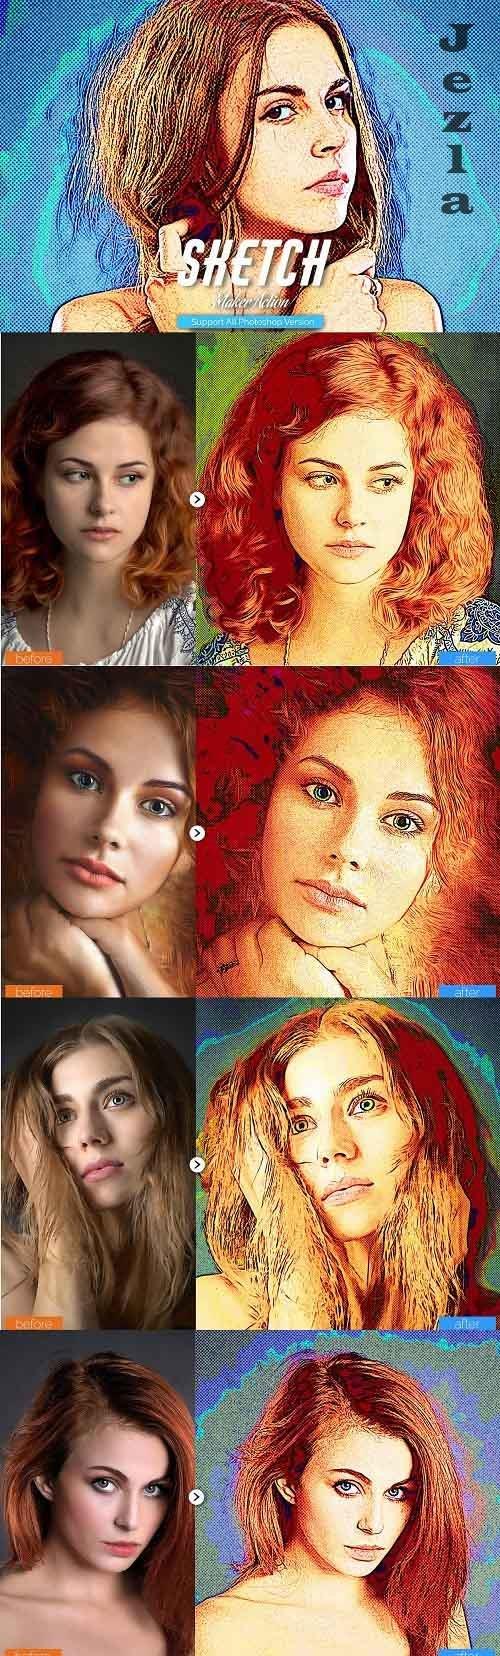 Color Sketch Photoshop Action - 5467192